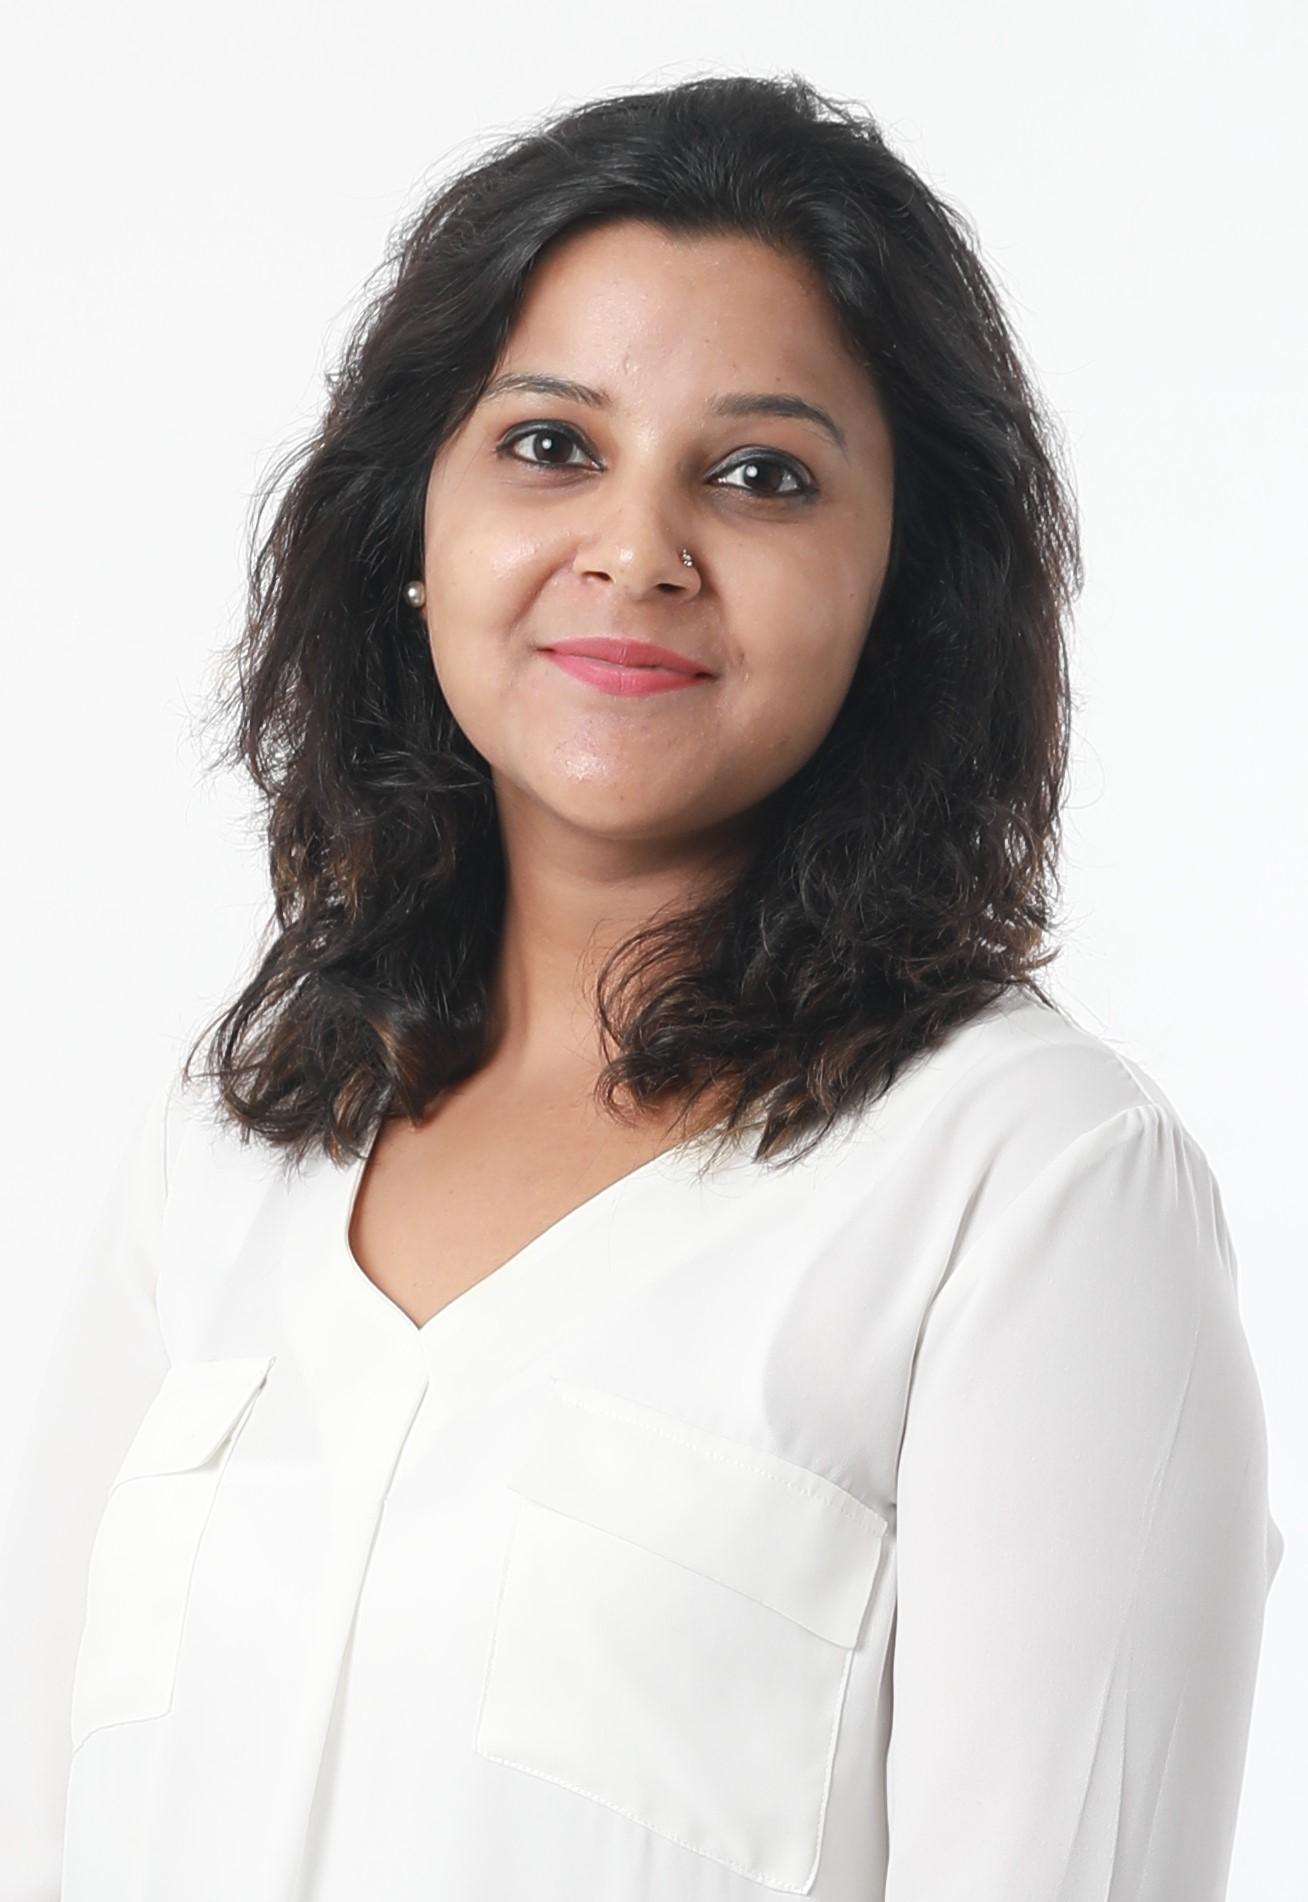 Shubhra Sinha